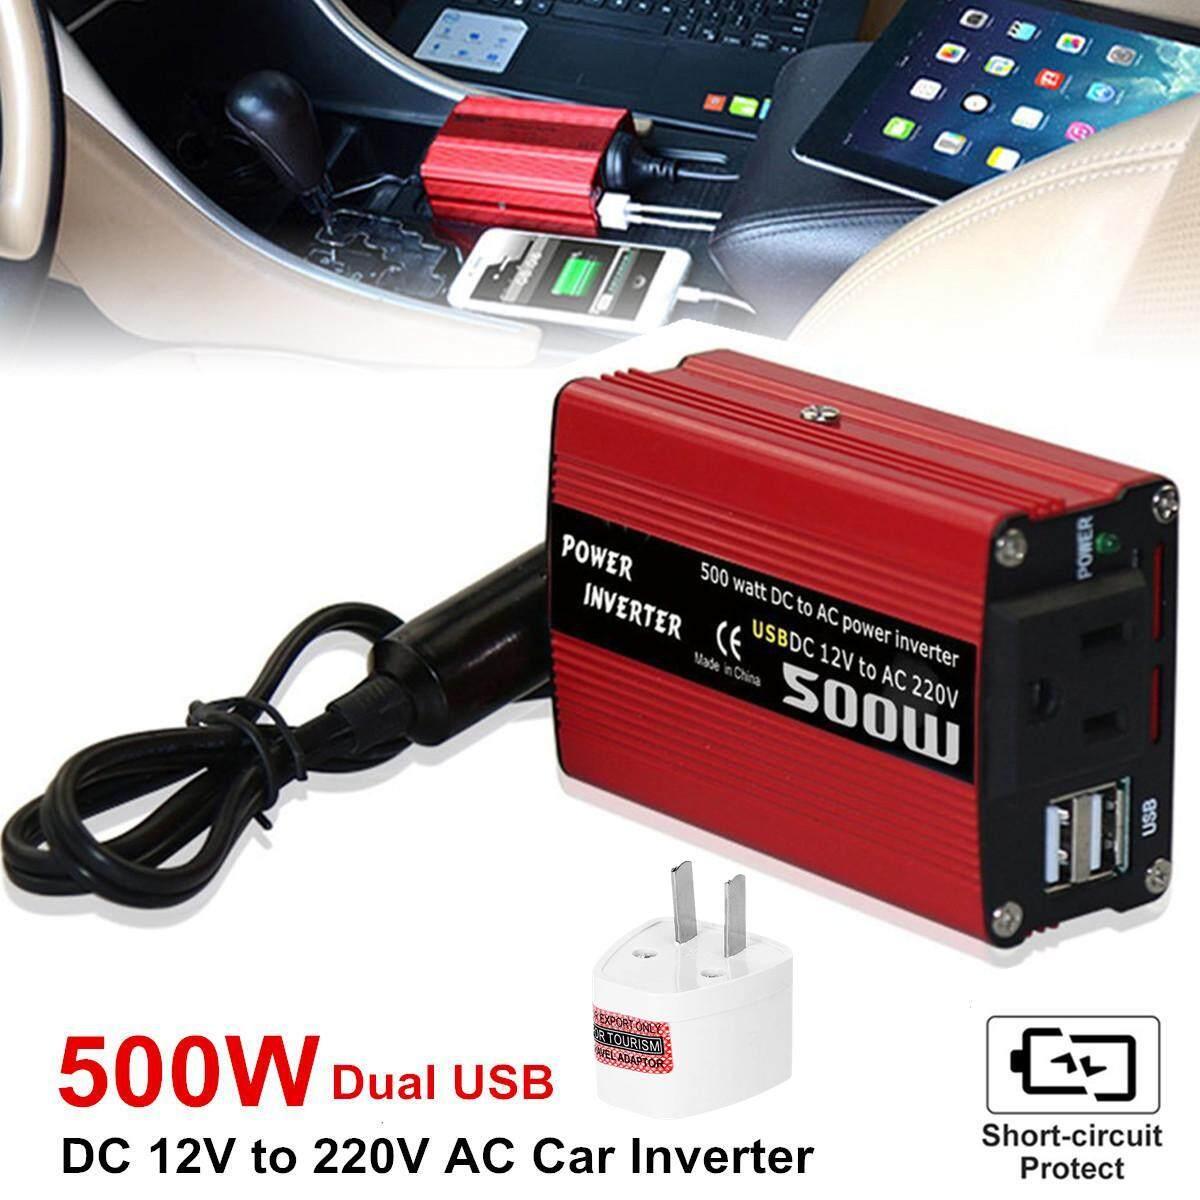 500 W Dc Untuk Konverter Daya Ac Dc 12 V Untuk 220 V Ac Inverter Mobil Dengan Usb Ganda By Gearray.